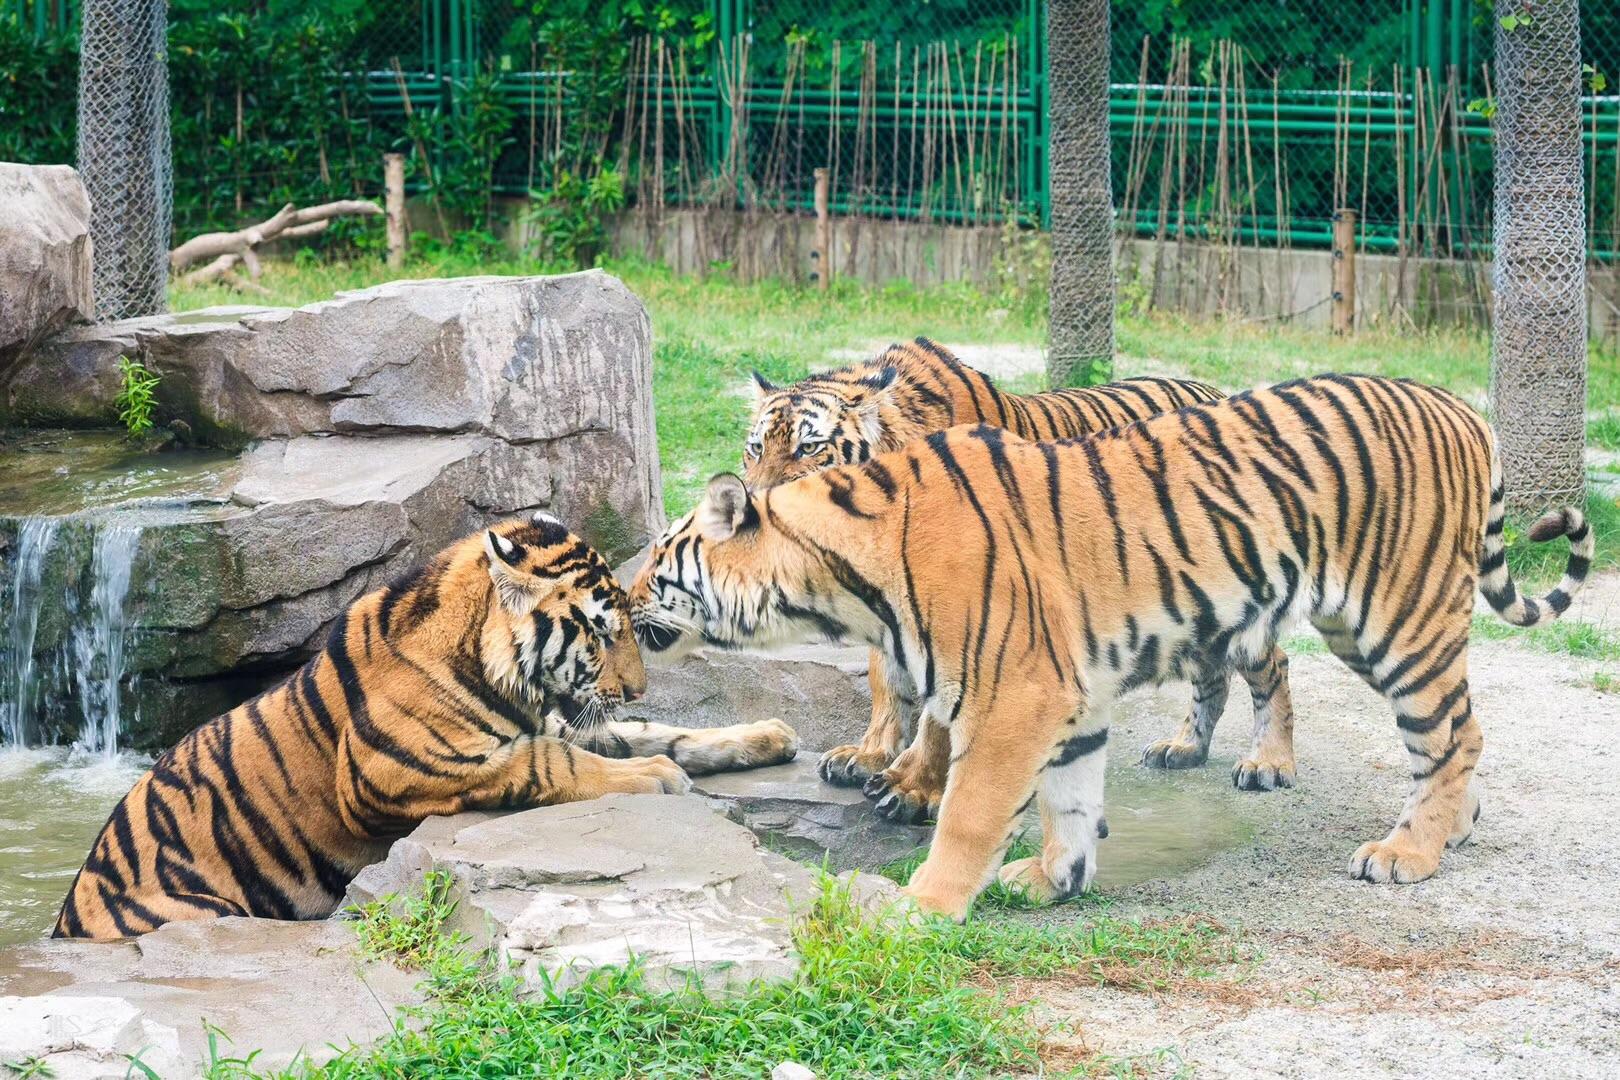 Shanghai Wild Animal Park